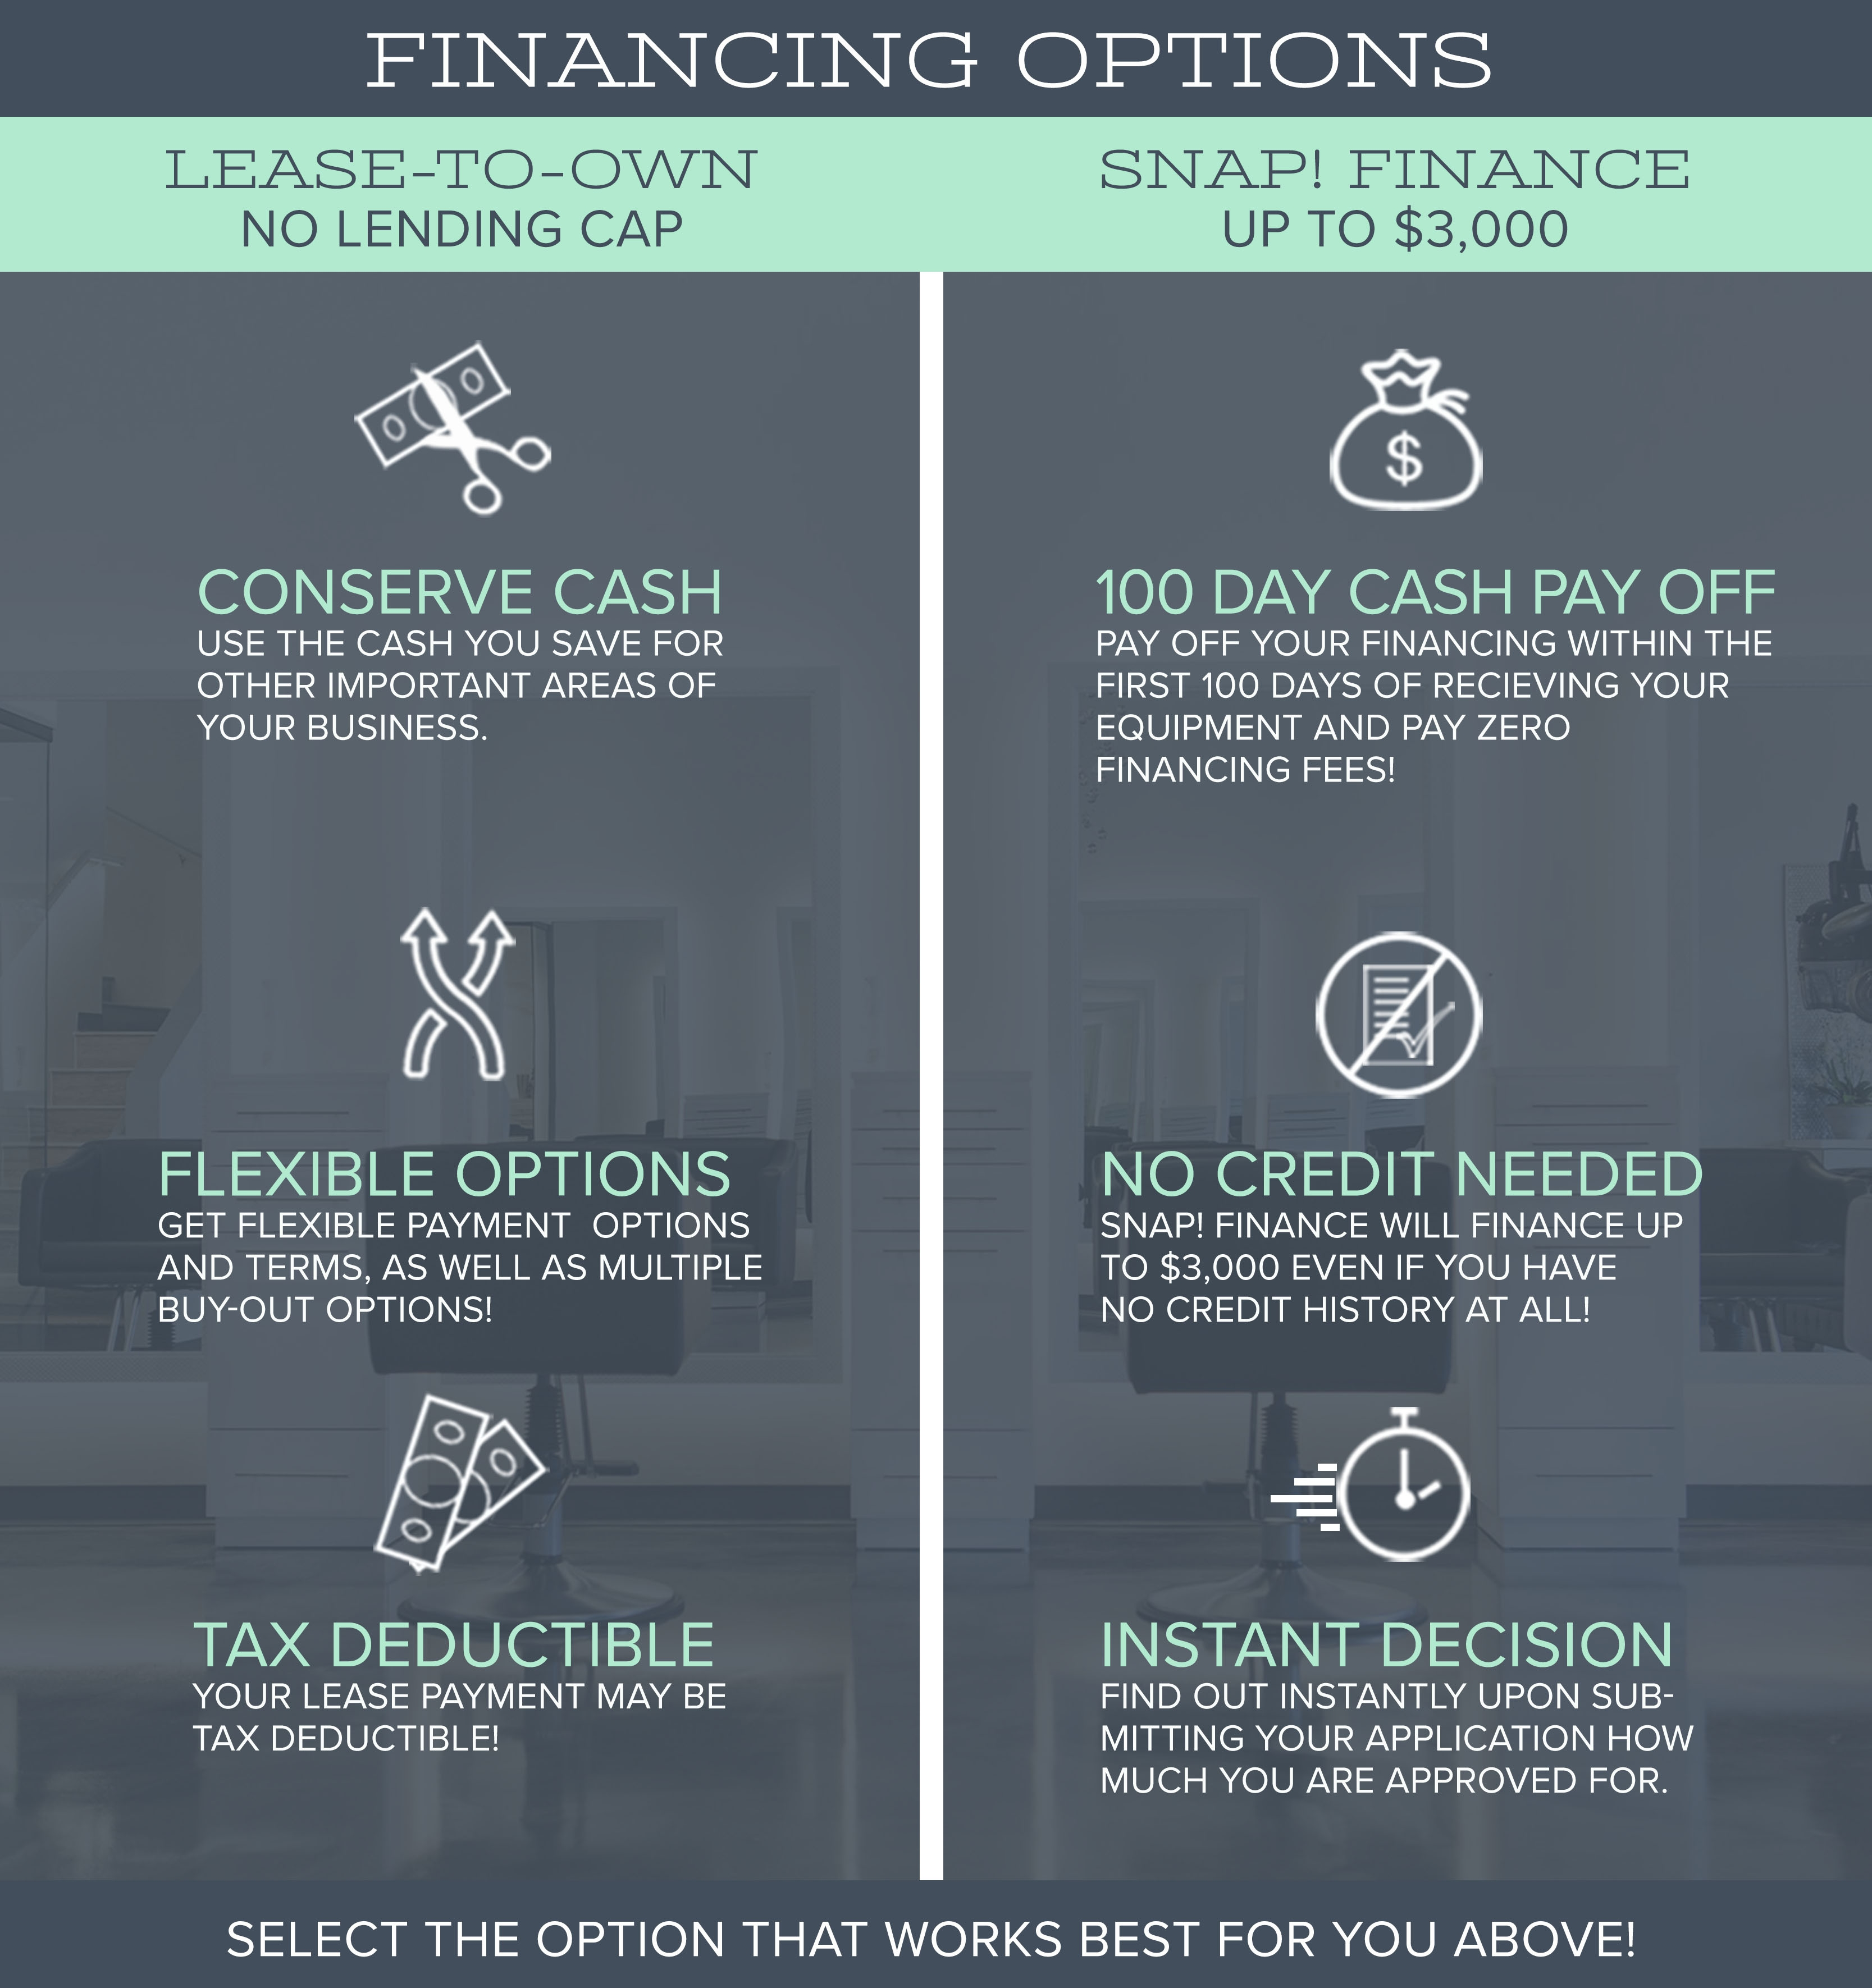 Snap Finance Bad Credit No Credit Needed Financing Up To >> Salon Equipment Financing Finance Salon Spa Barber Equipment